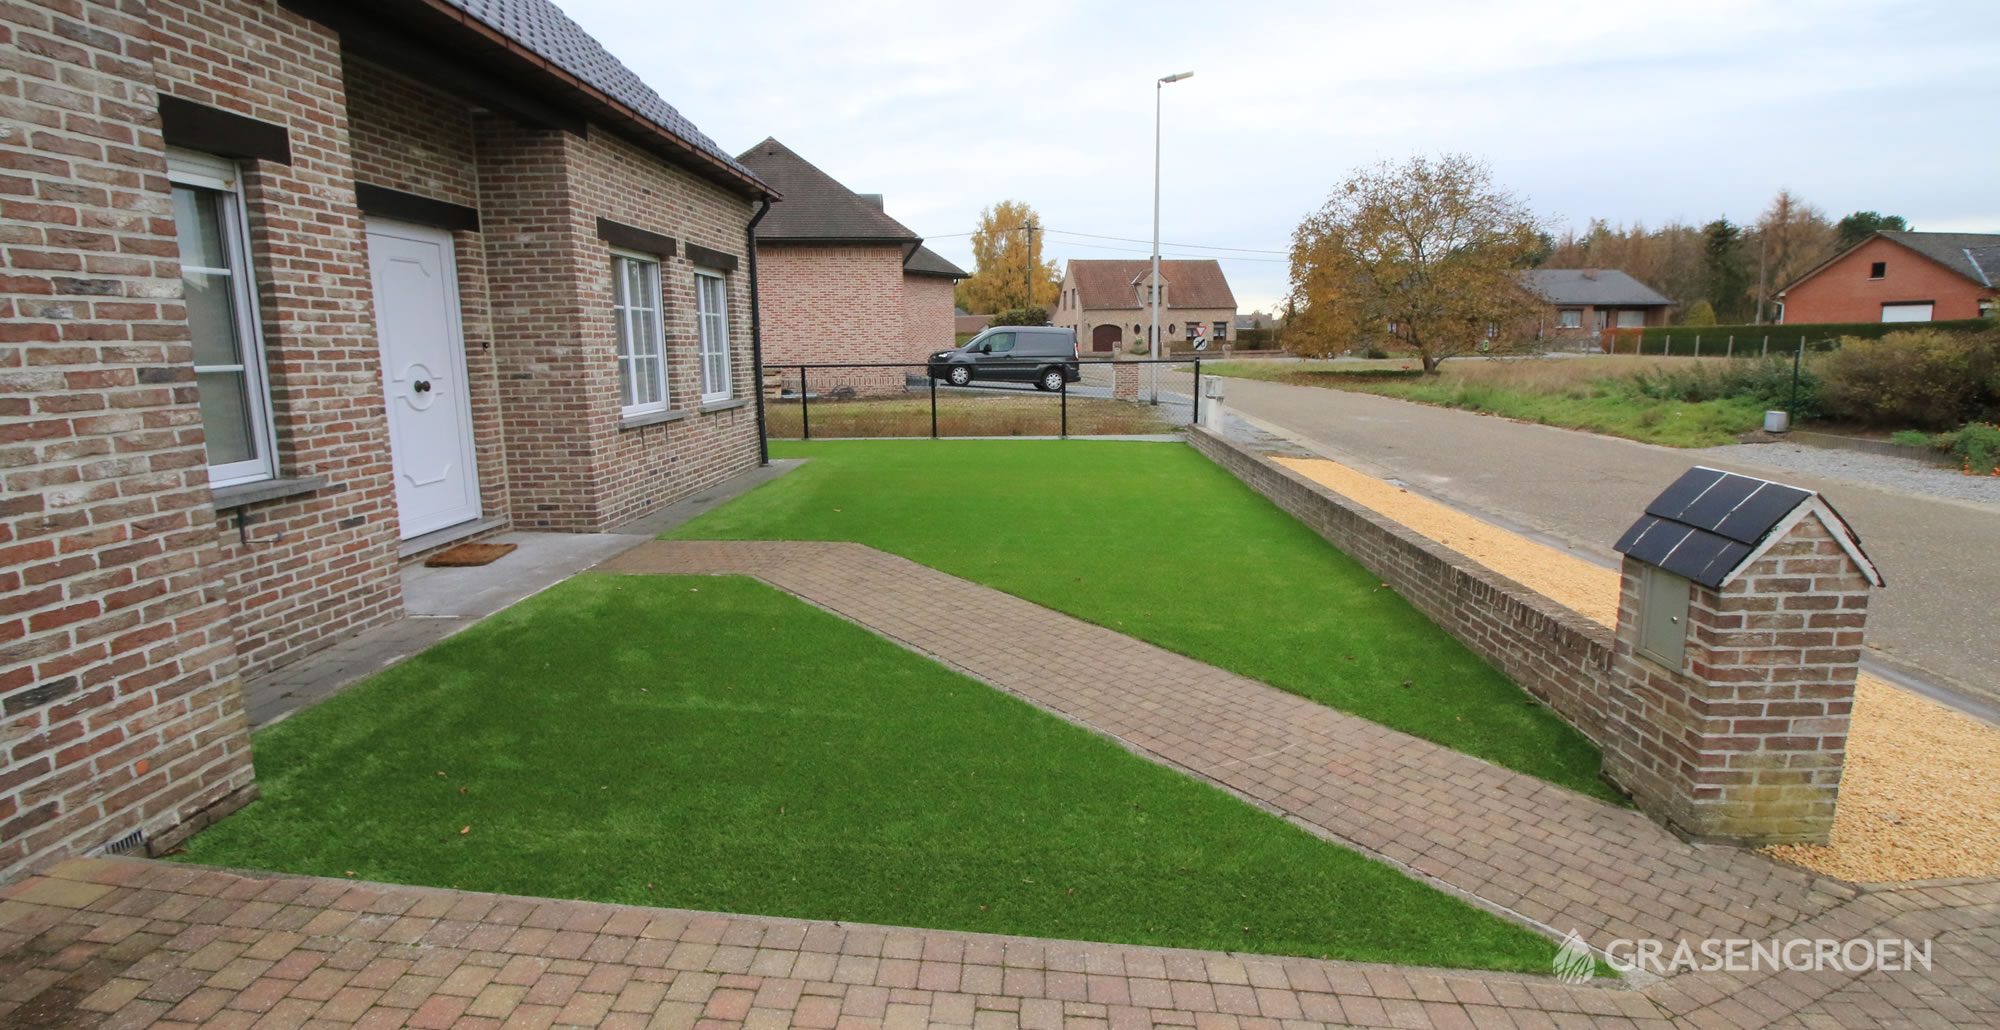 Kunstgrasleggenzelem15 • Gras en Groen Kunstgras